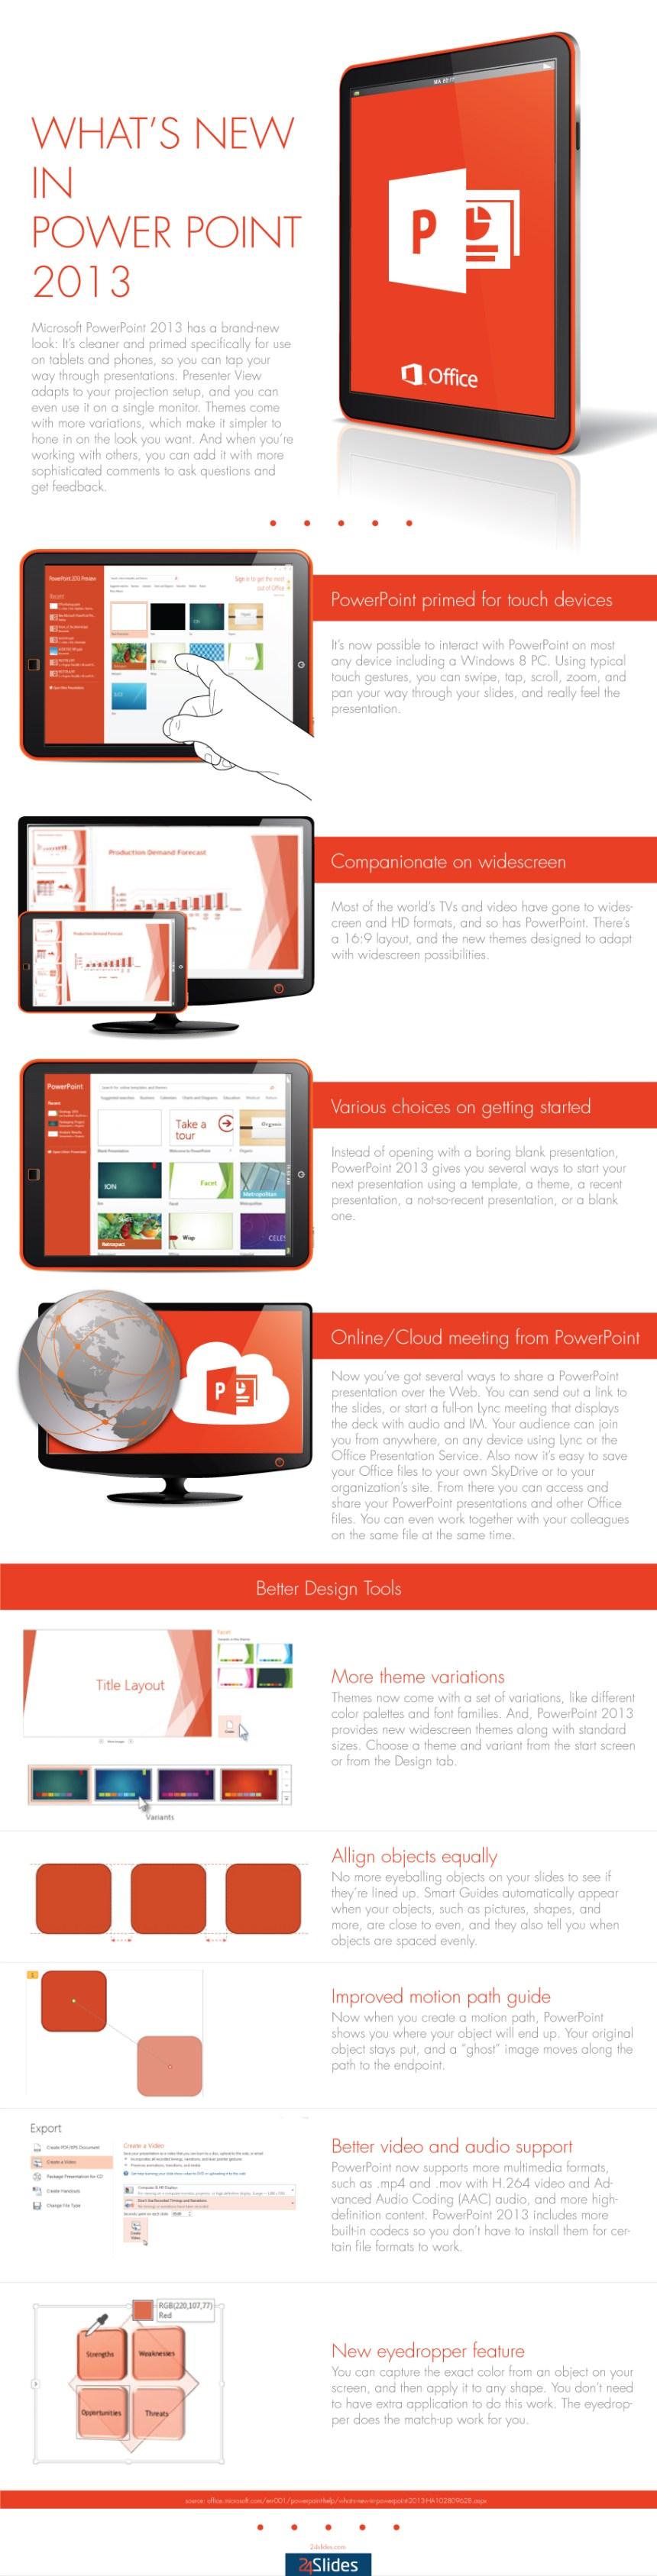 Novedades PowerPoint 2013